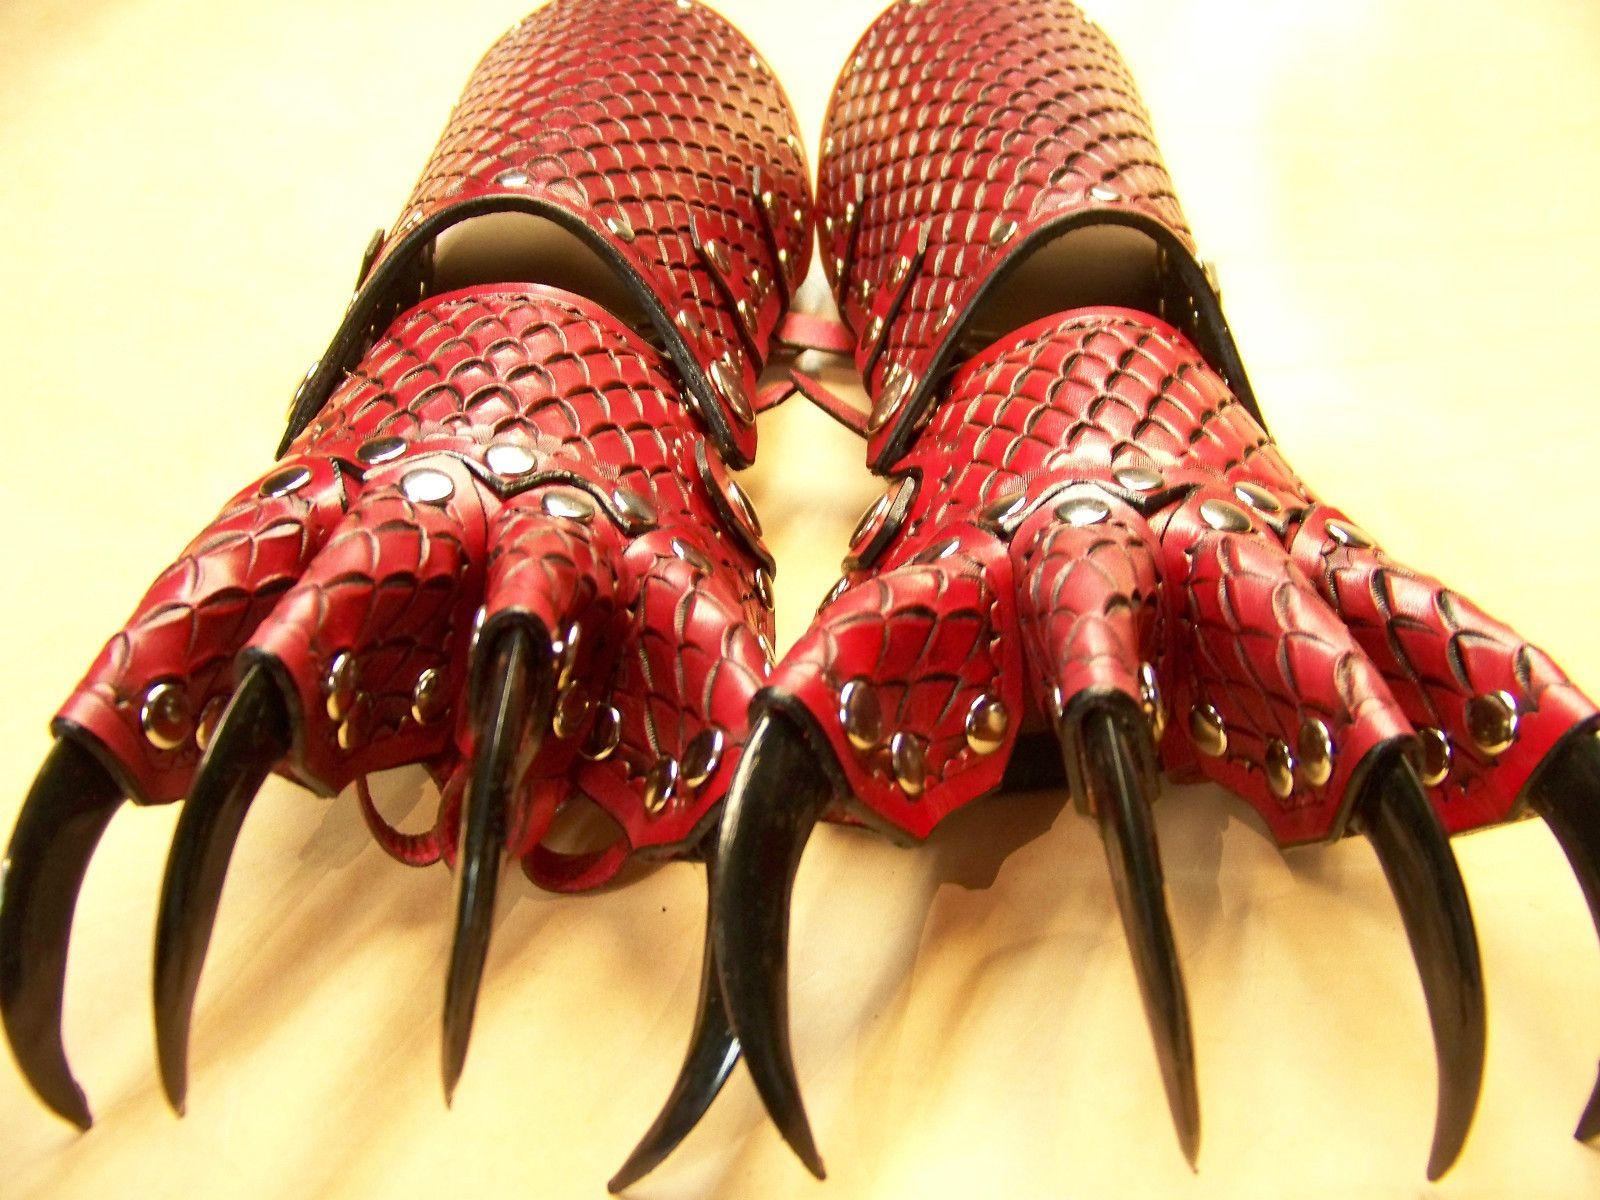 Black leather gloves skyrim - Red Black Leather Dragon Clawed Gloves Gauntlets